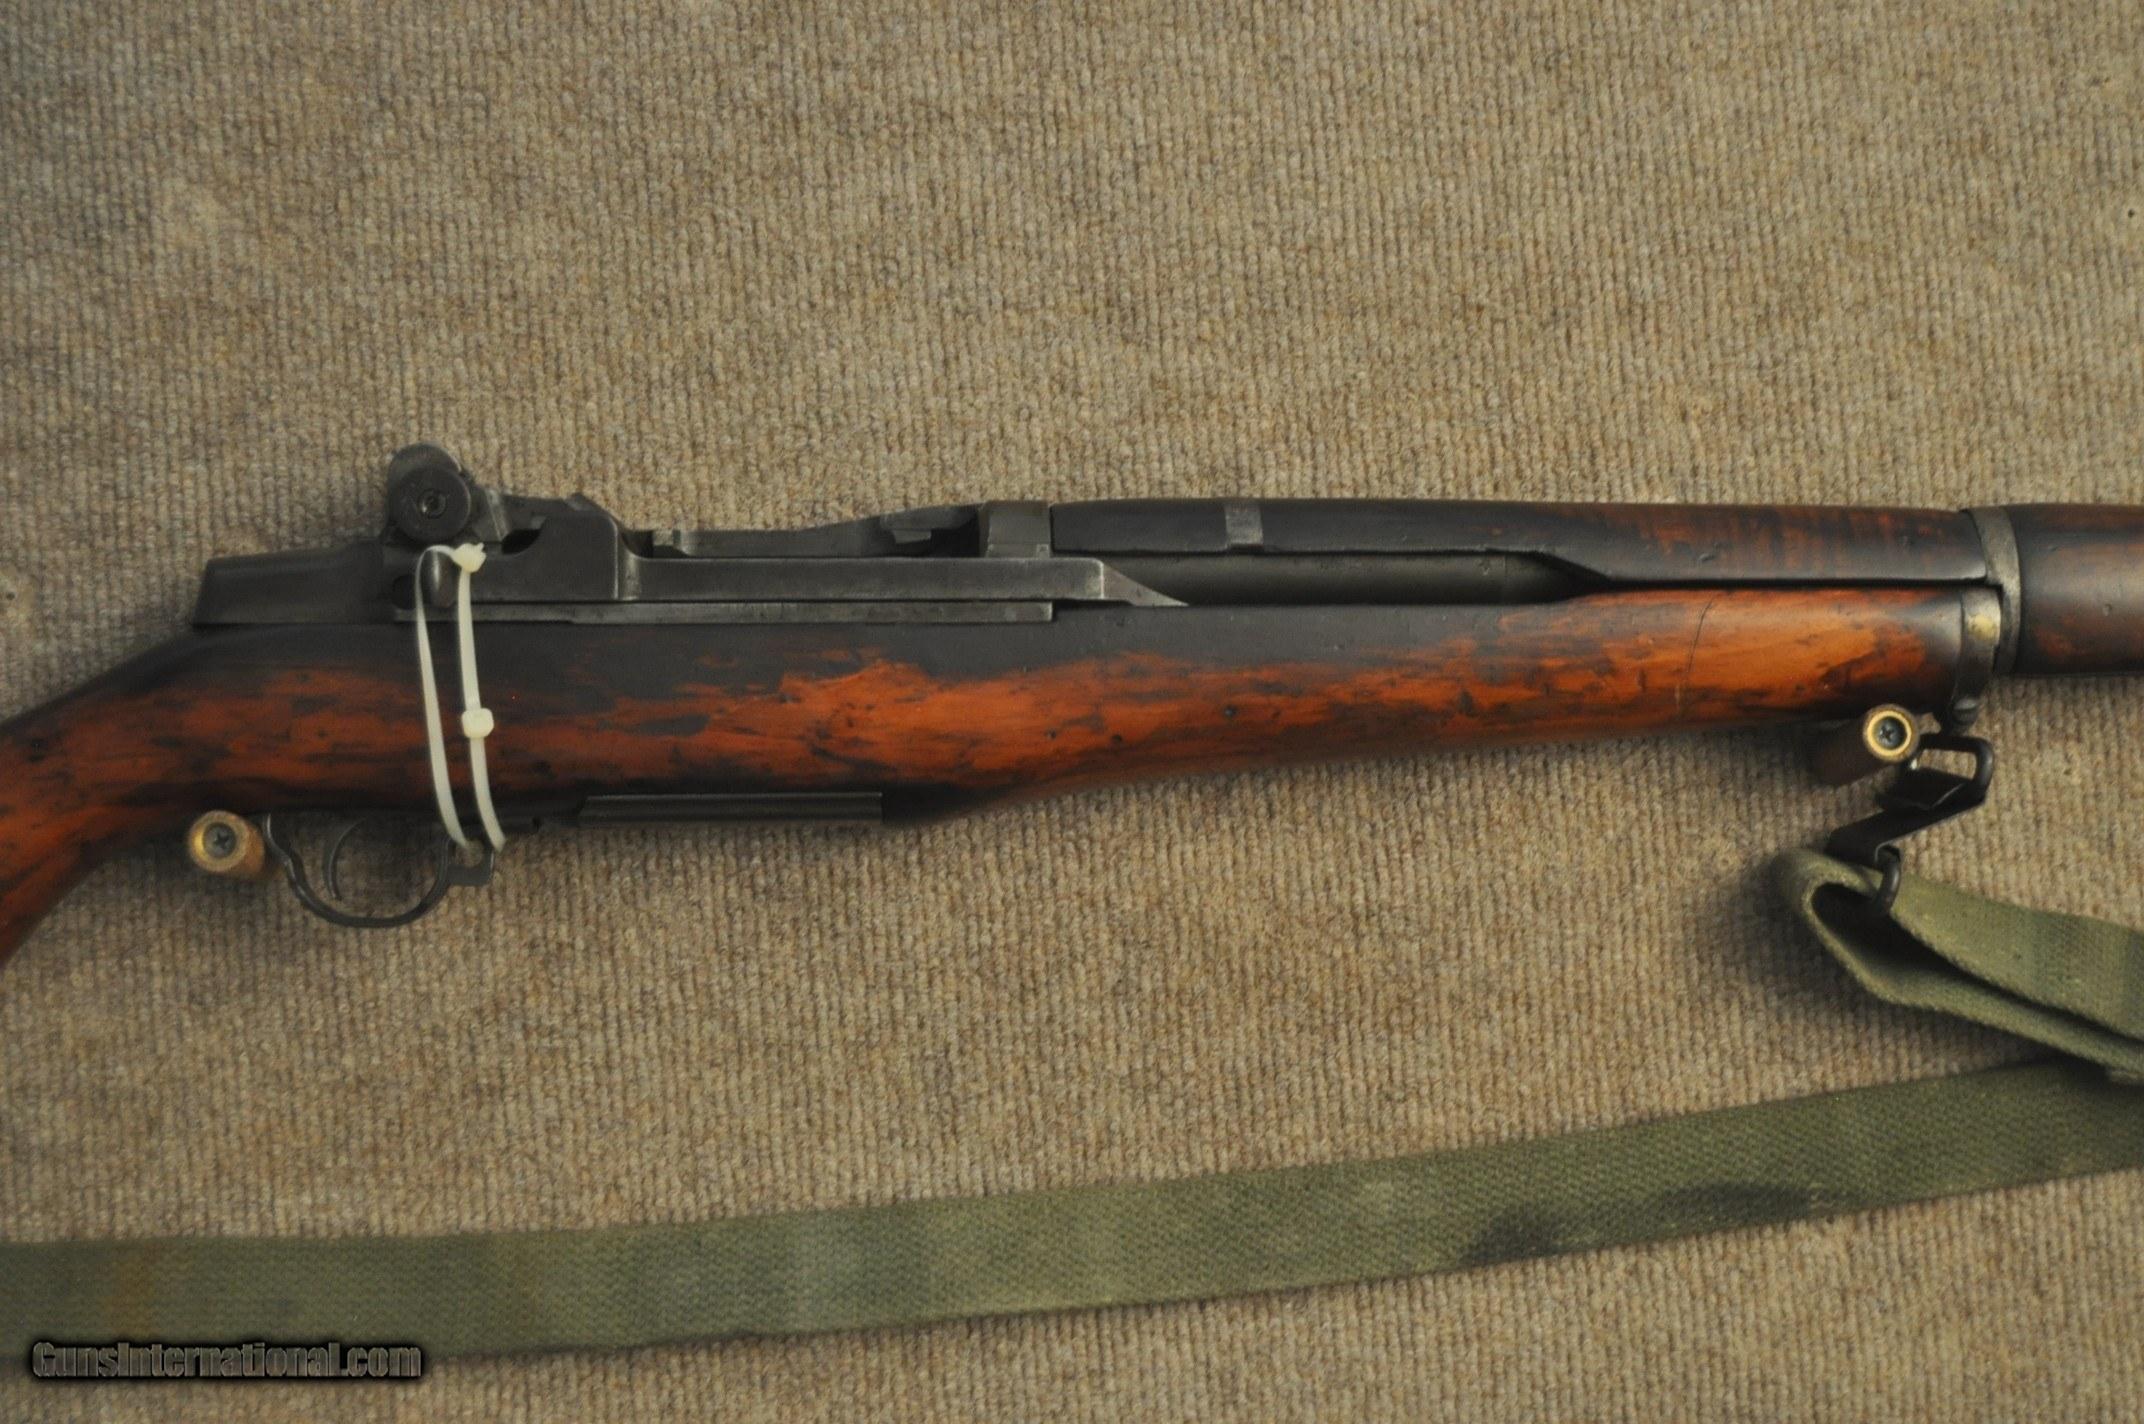 Beretta M1 Garand Rifle - Indonesion, VERY RARE! for sale